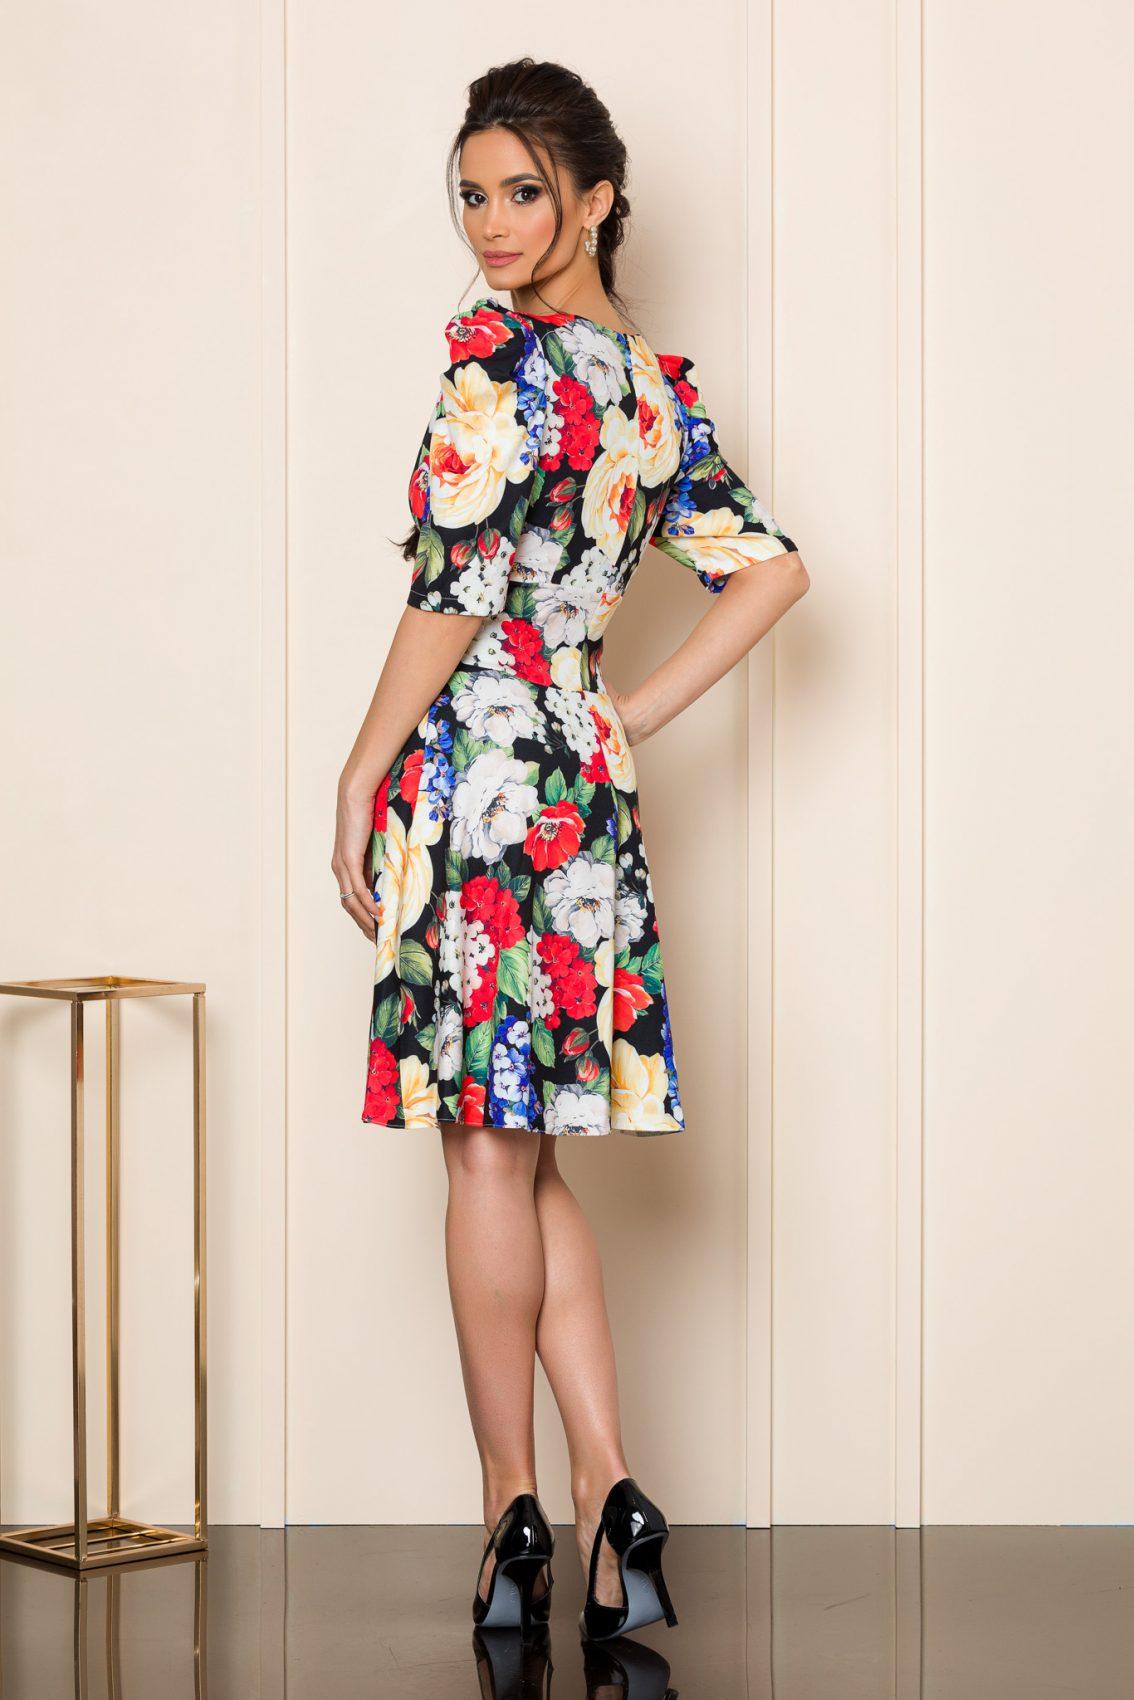 Floral Φόρεμα Με Φουσκωτό Μανίκι Renee 8016 2